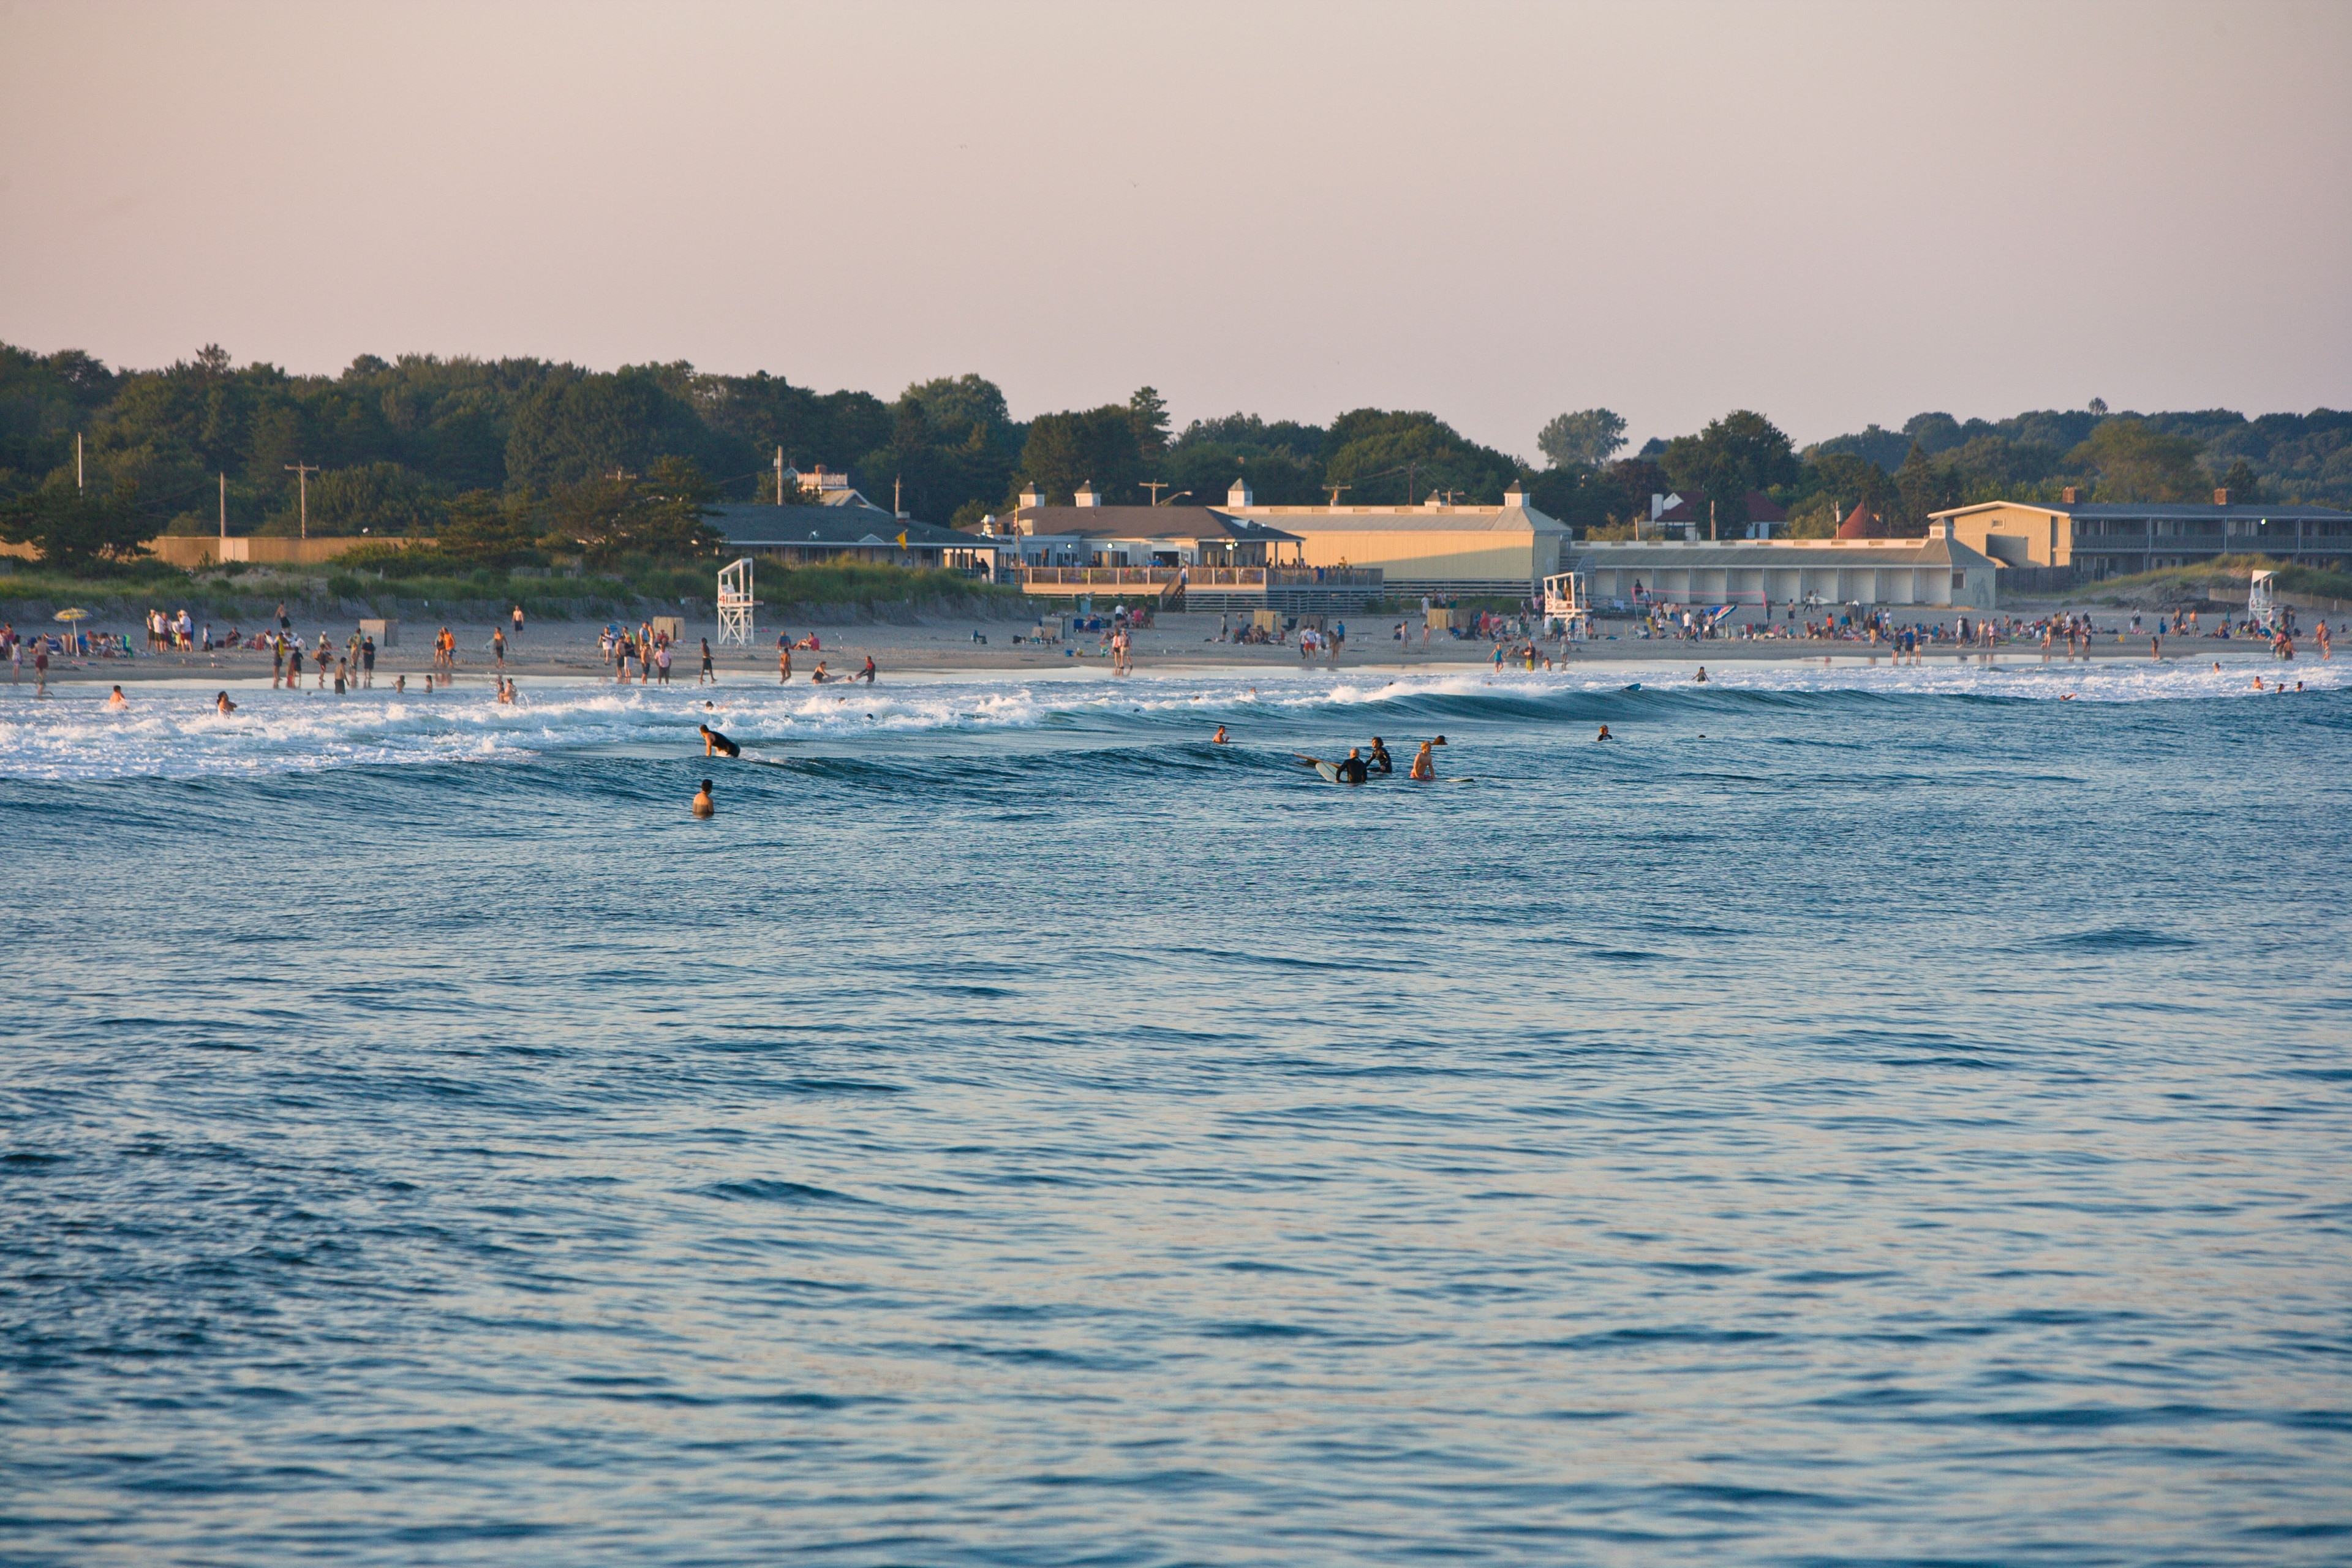 Narragansett Beach, Narragansett, Rhode Island, United States of America